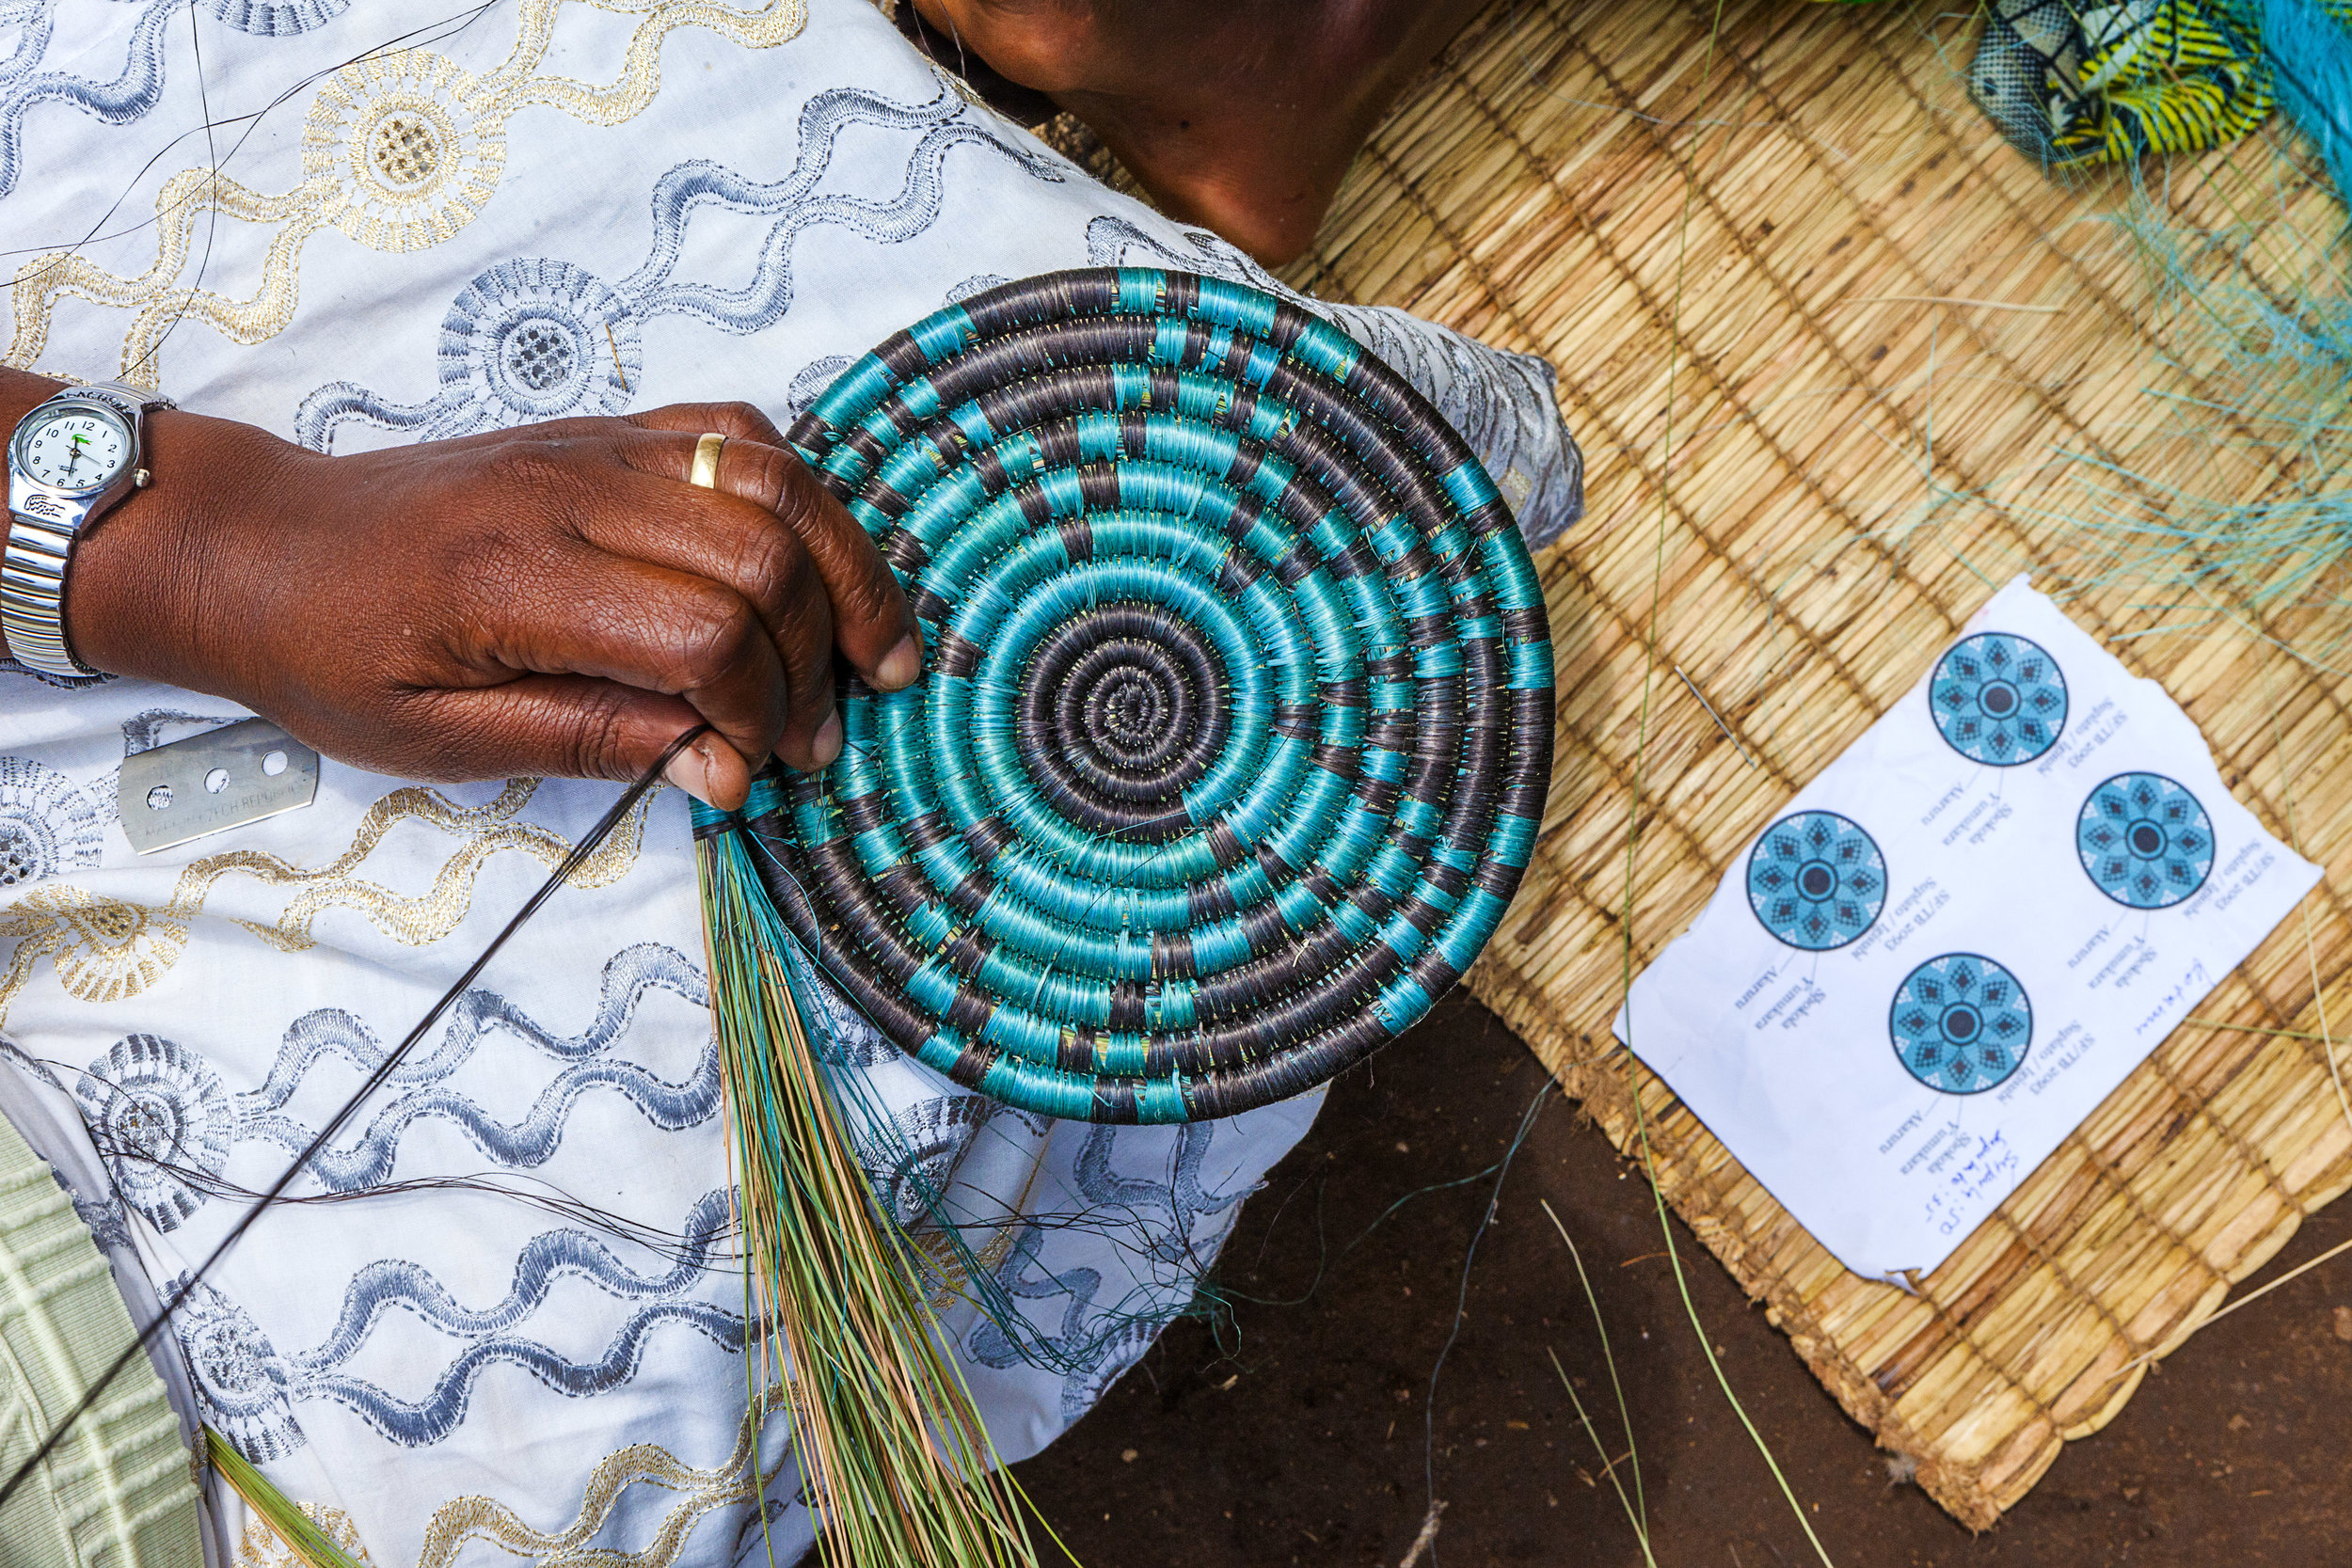 USADF grantee Gahaya Links is an artisan cooperative in Rwanda empowering cross-generations of women and girls, widows and orphans, and Hutu and Tutsi alike to build bridges through artisan enterprise.